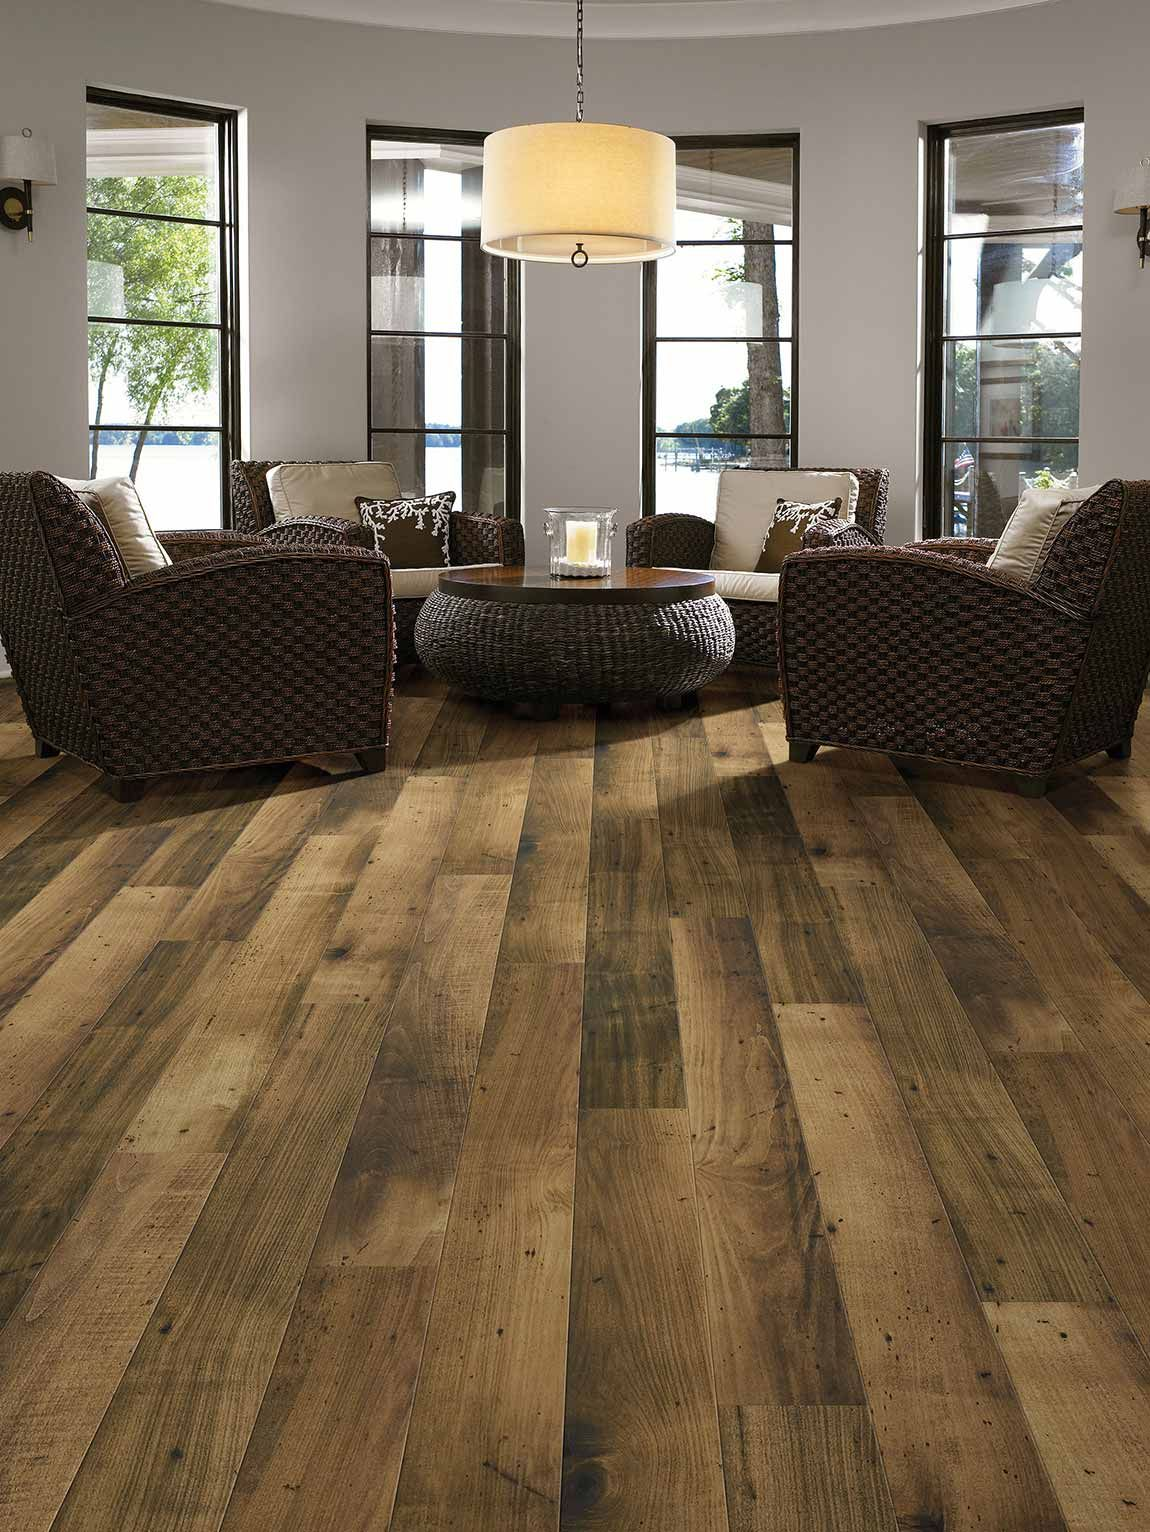 Living RoomModern ContemporaryWood LookMedium Wood